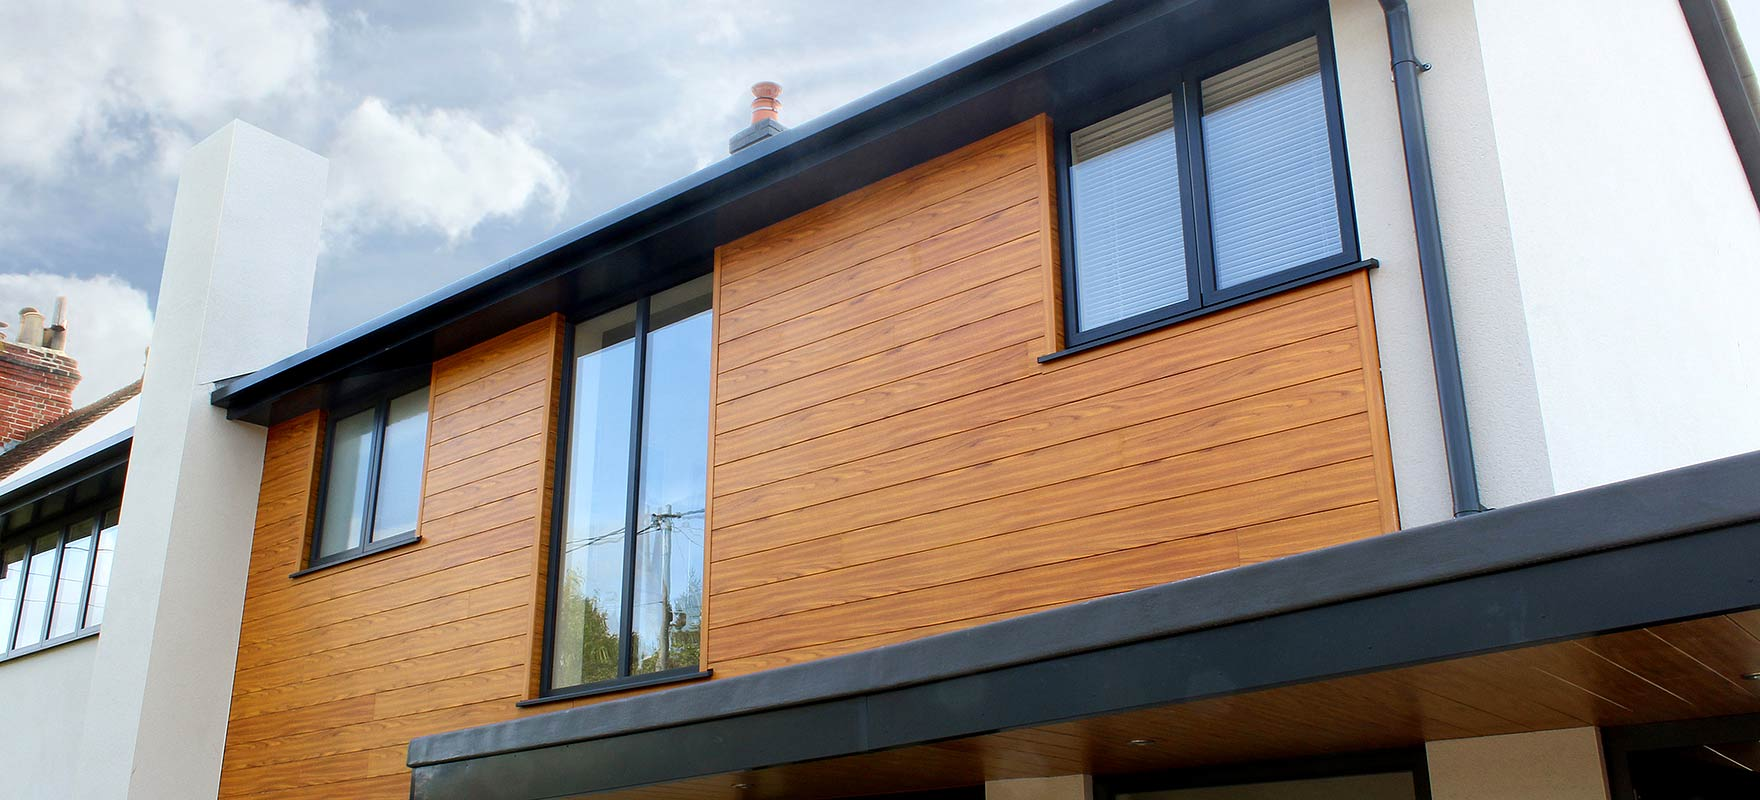 VulcaLap Wood aluminium cladding T&G 'Chestnut'